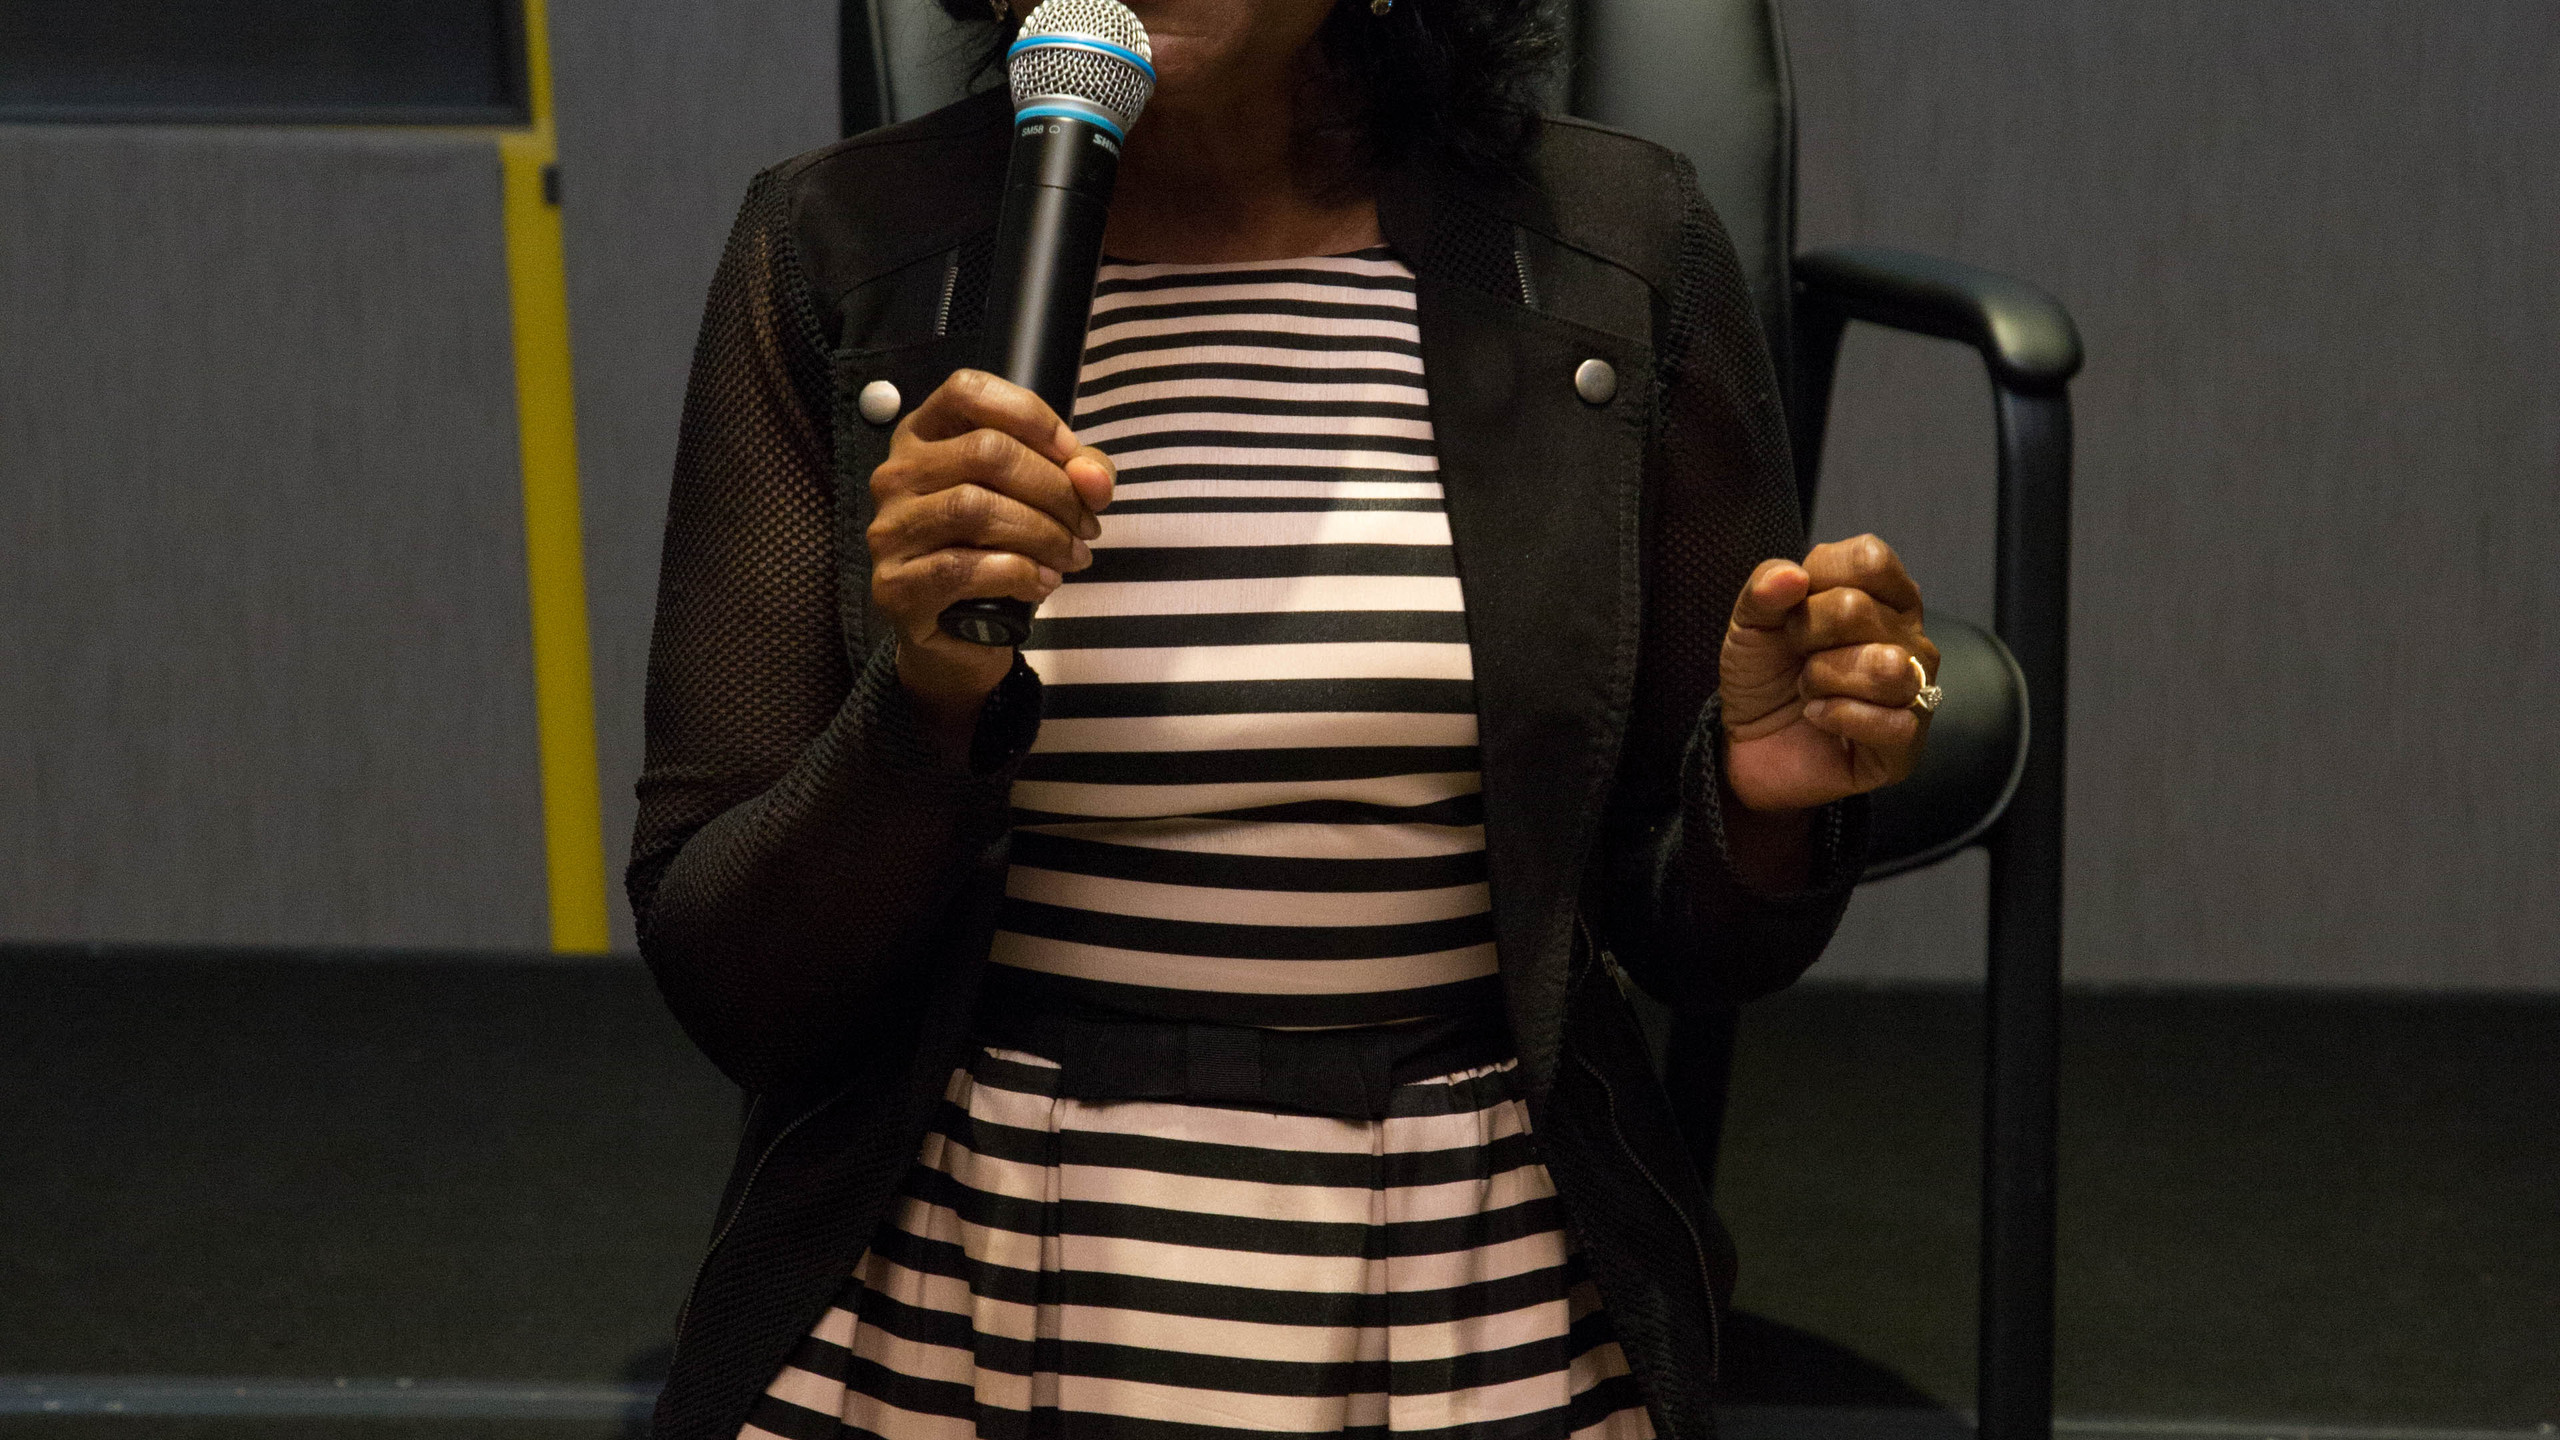 BWFN founder Sheryl Gripper makes remarks